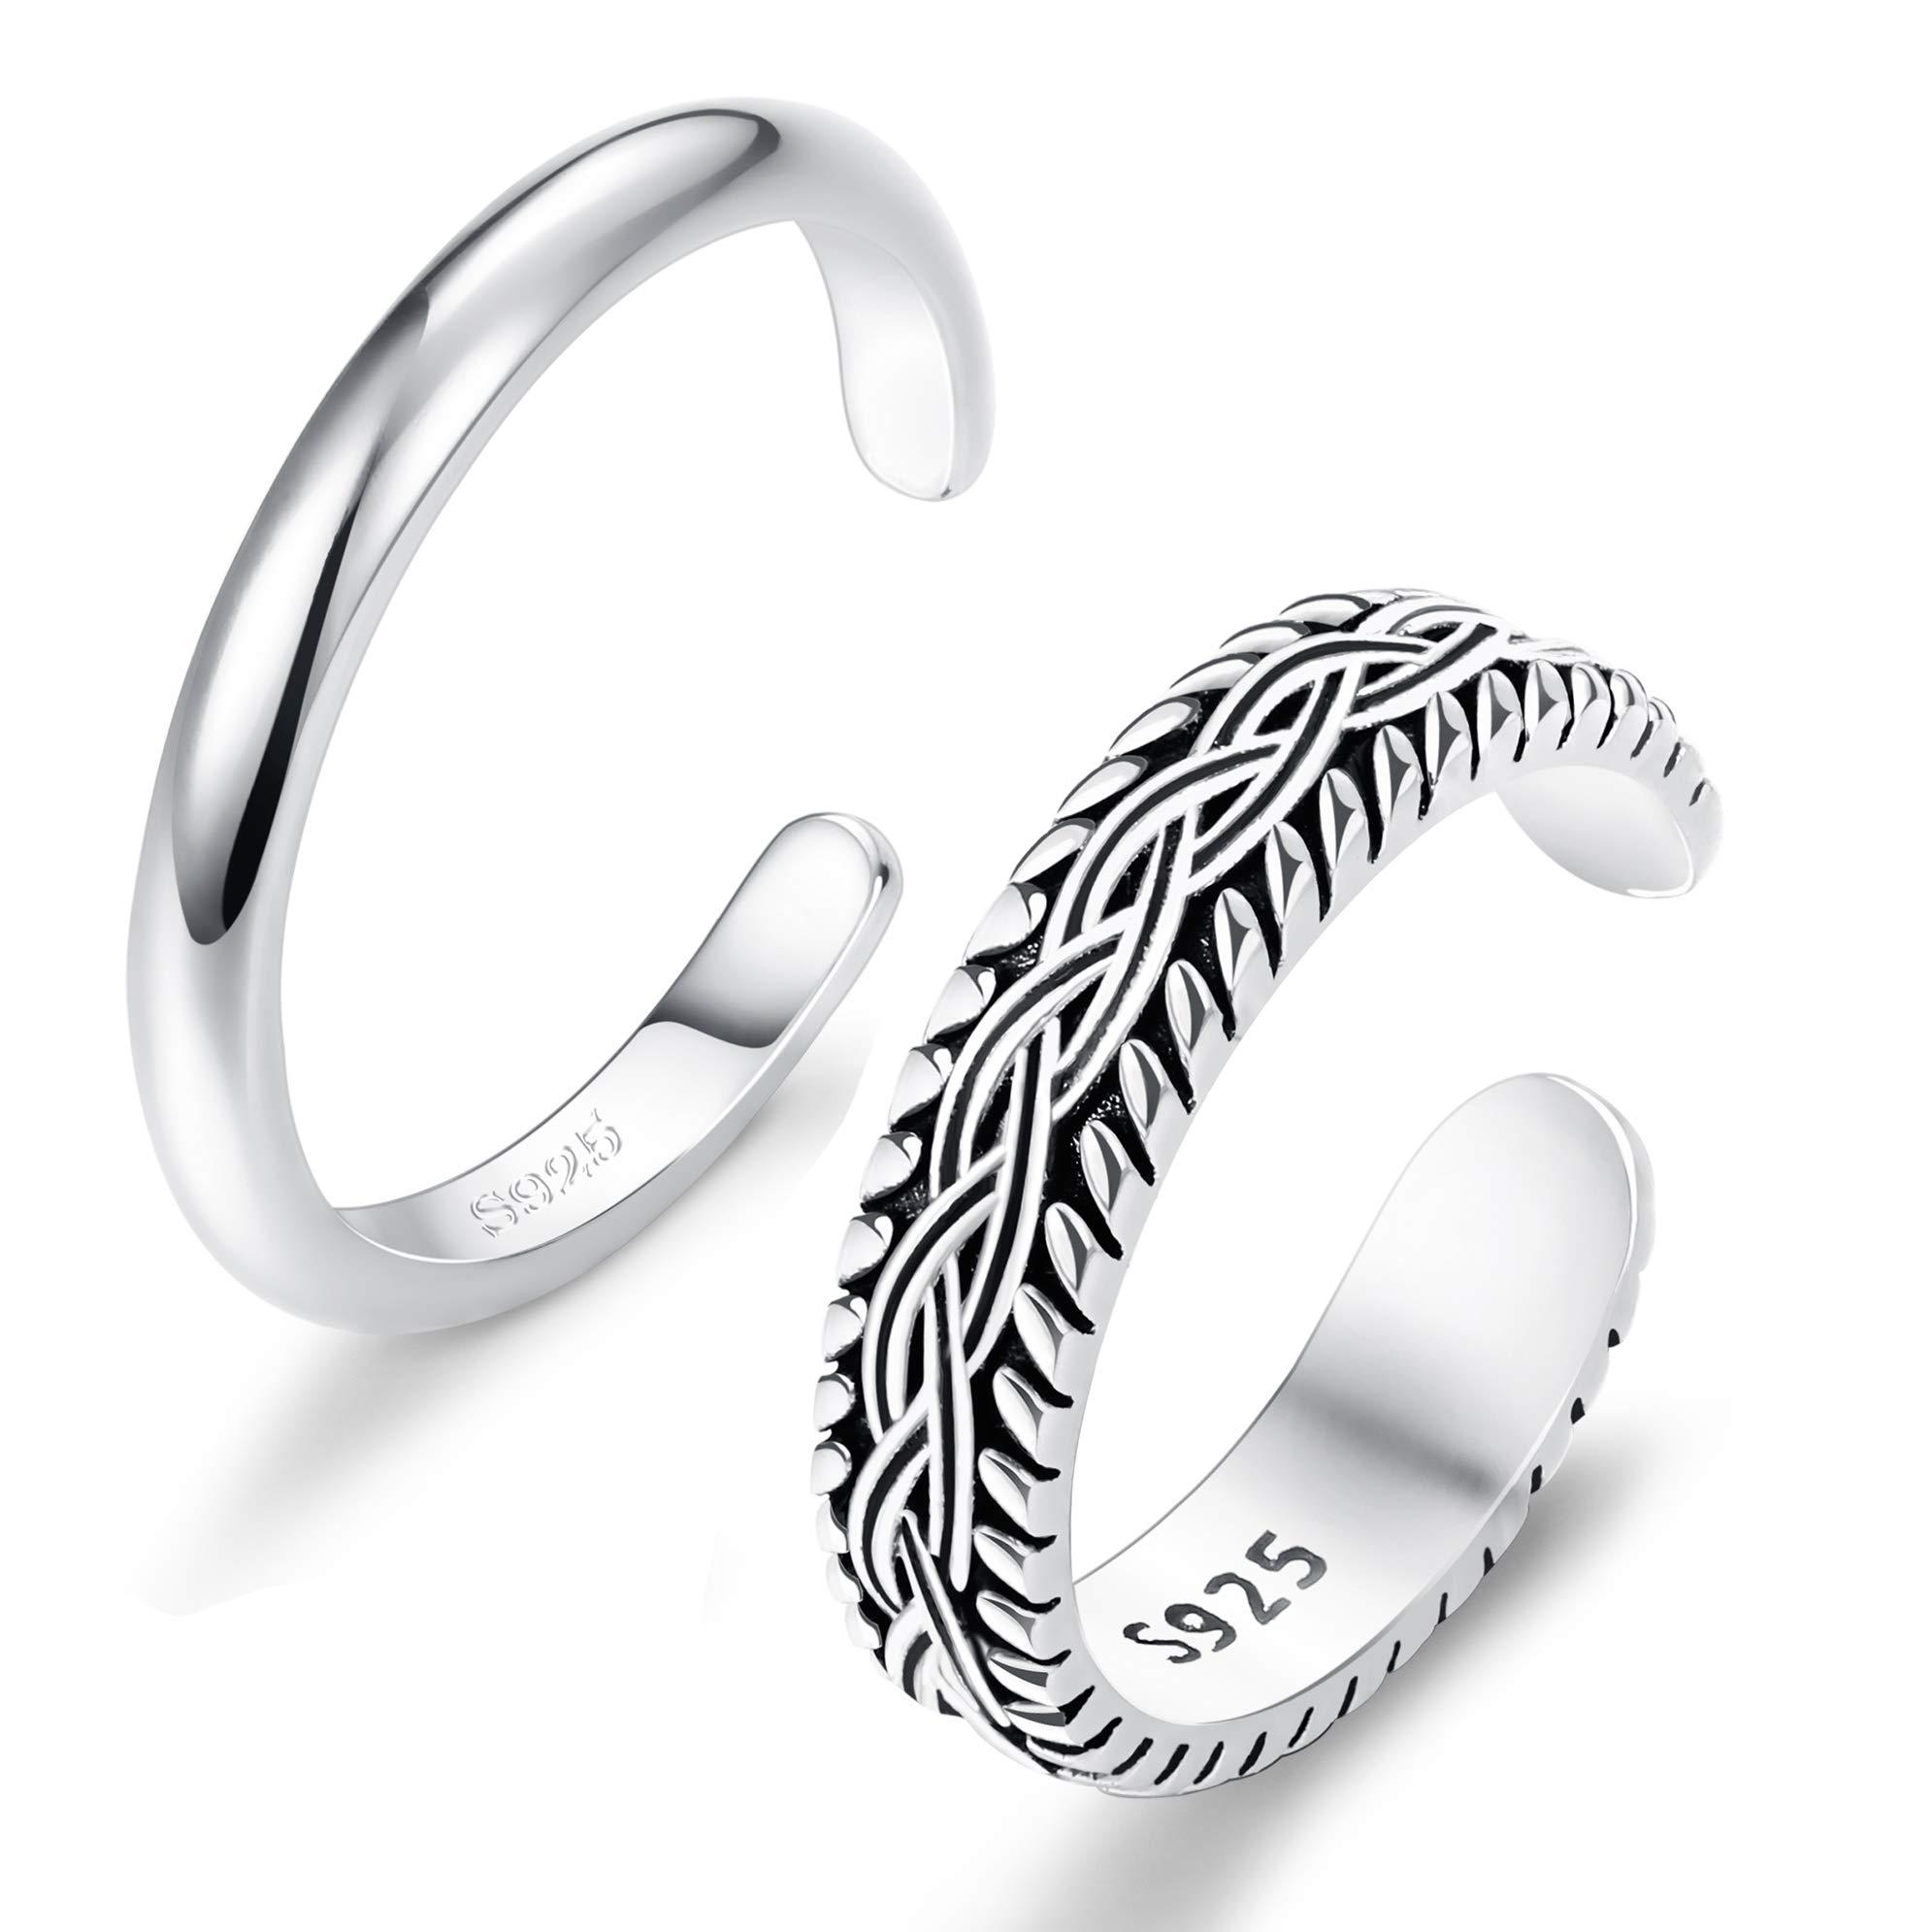 FUNRUN JEWELRY 2 PCS Sterling Silver Toe Ring for Women Girls Retro Vintage Design Adjustable Ring Set